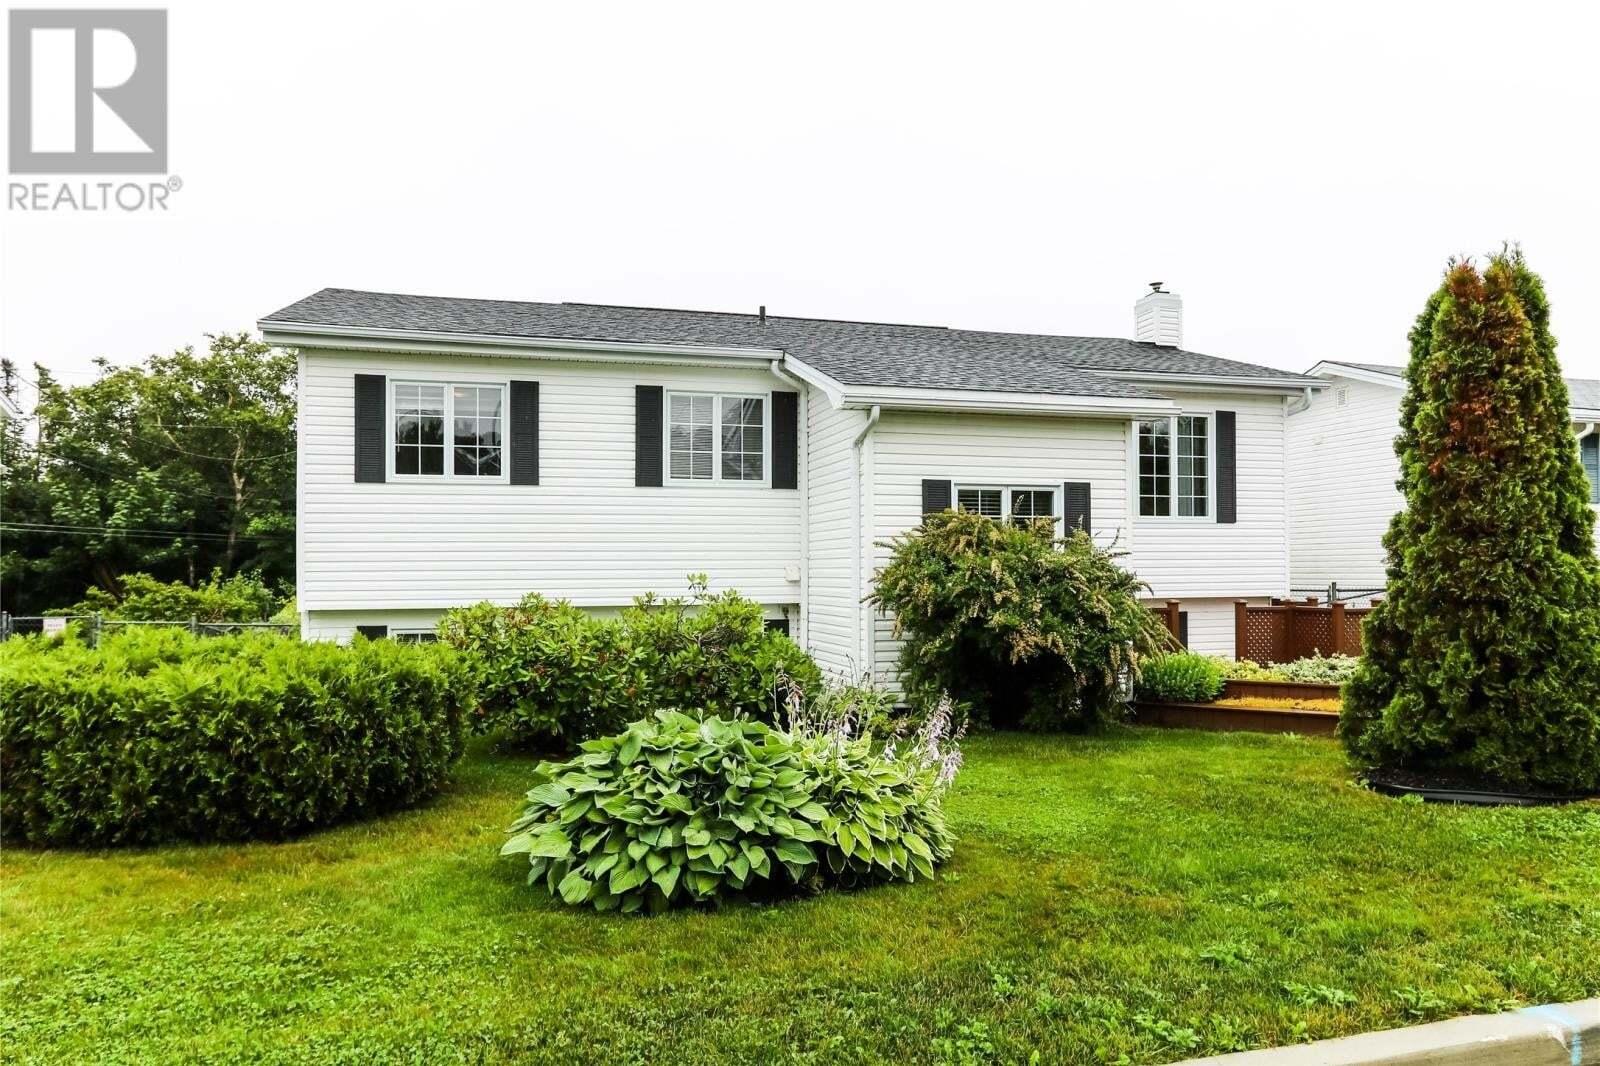 House for sale at 6 Rigolet Cres St. John's Newfoundland - MLS: 1218126